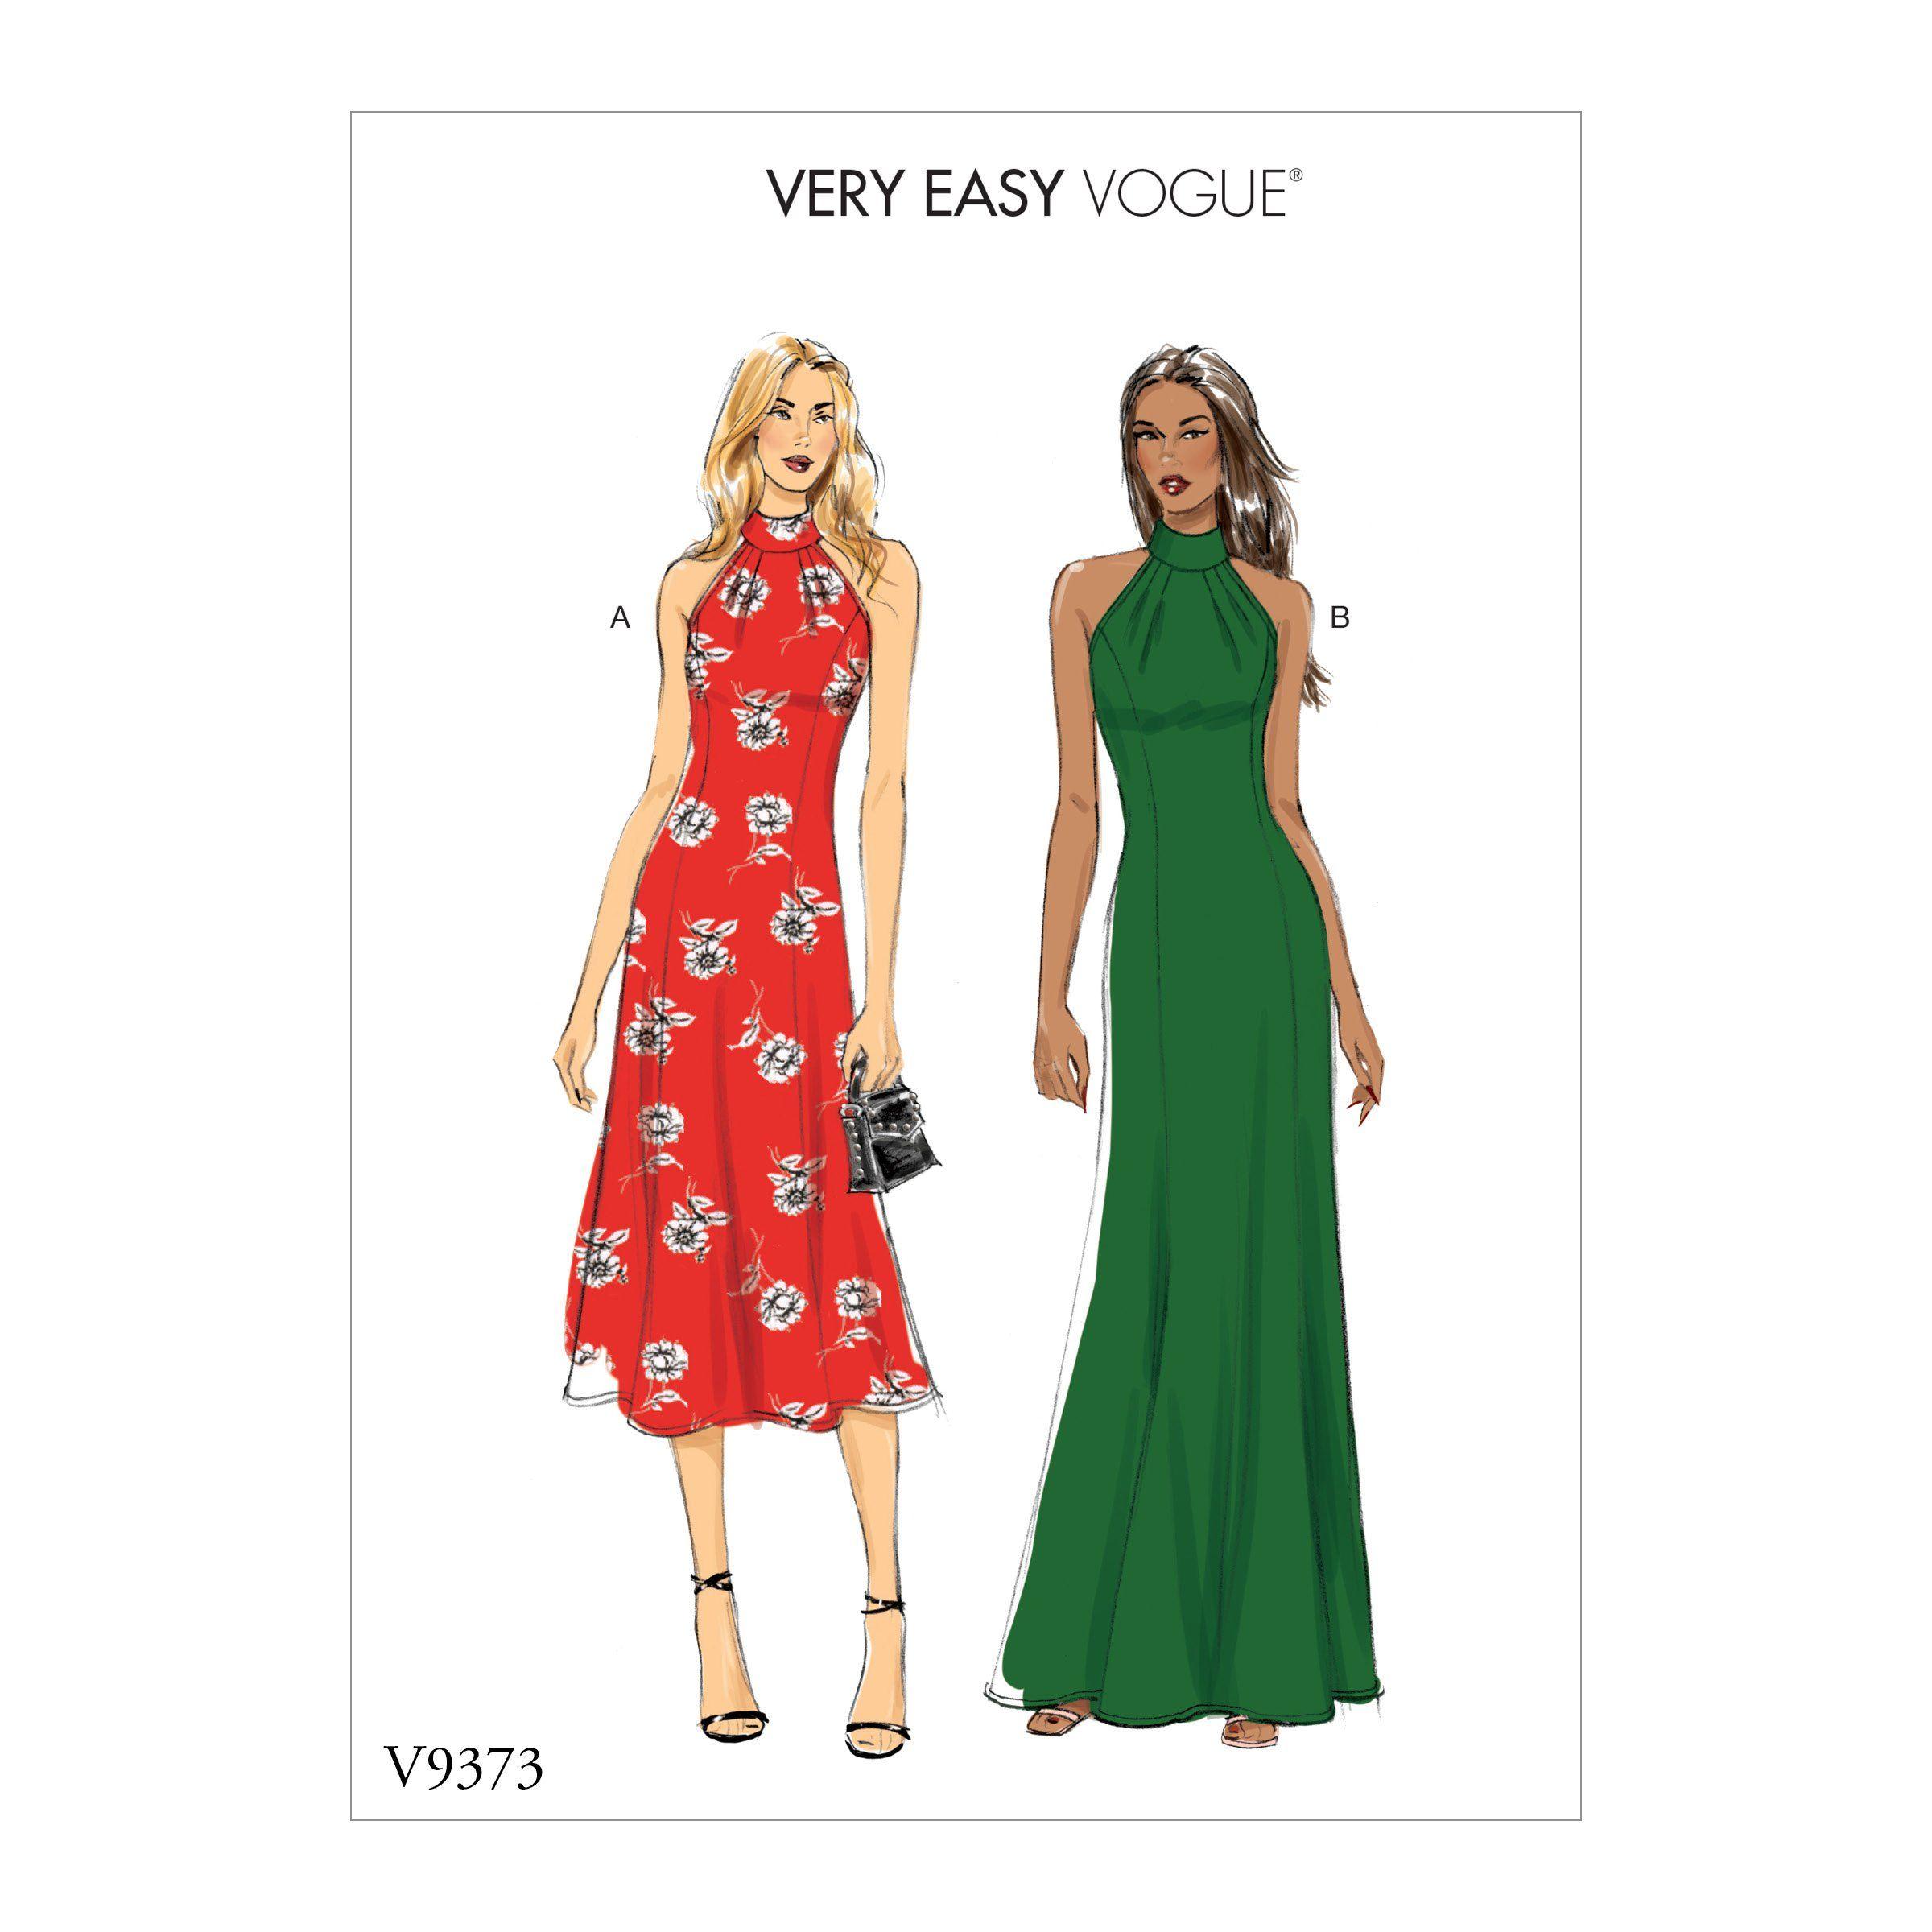 Vogue Patterns 9373 Misses Special Occasion Dress Vogue Sewing Patterns Vogue Patterns Sewing Dresses [ 2400 x 2400 Pixel ]